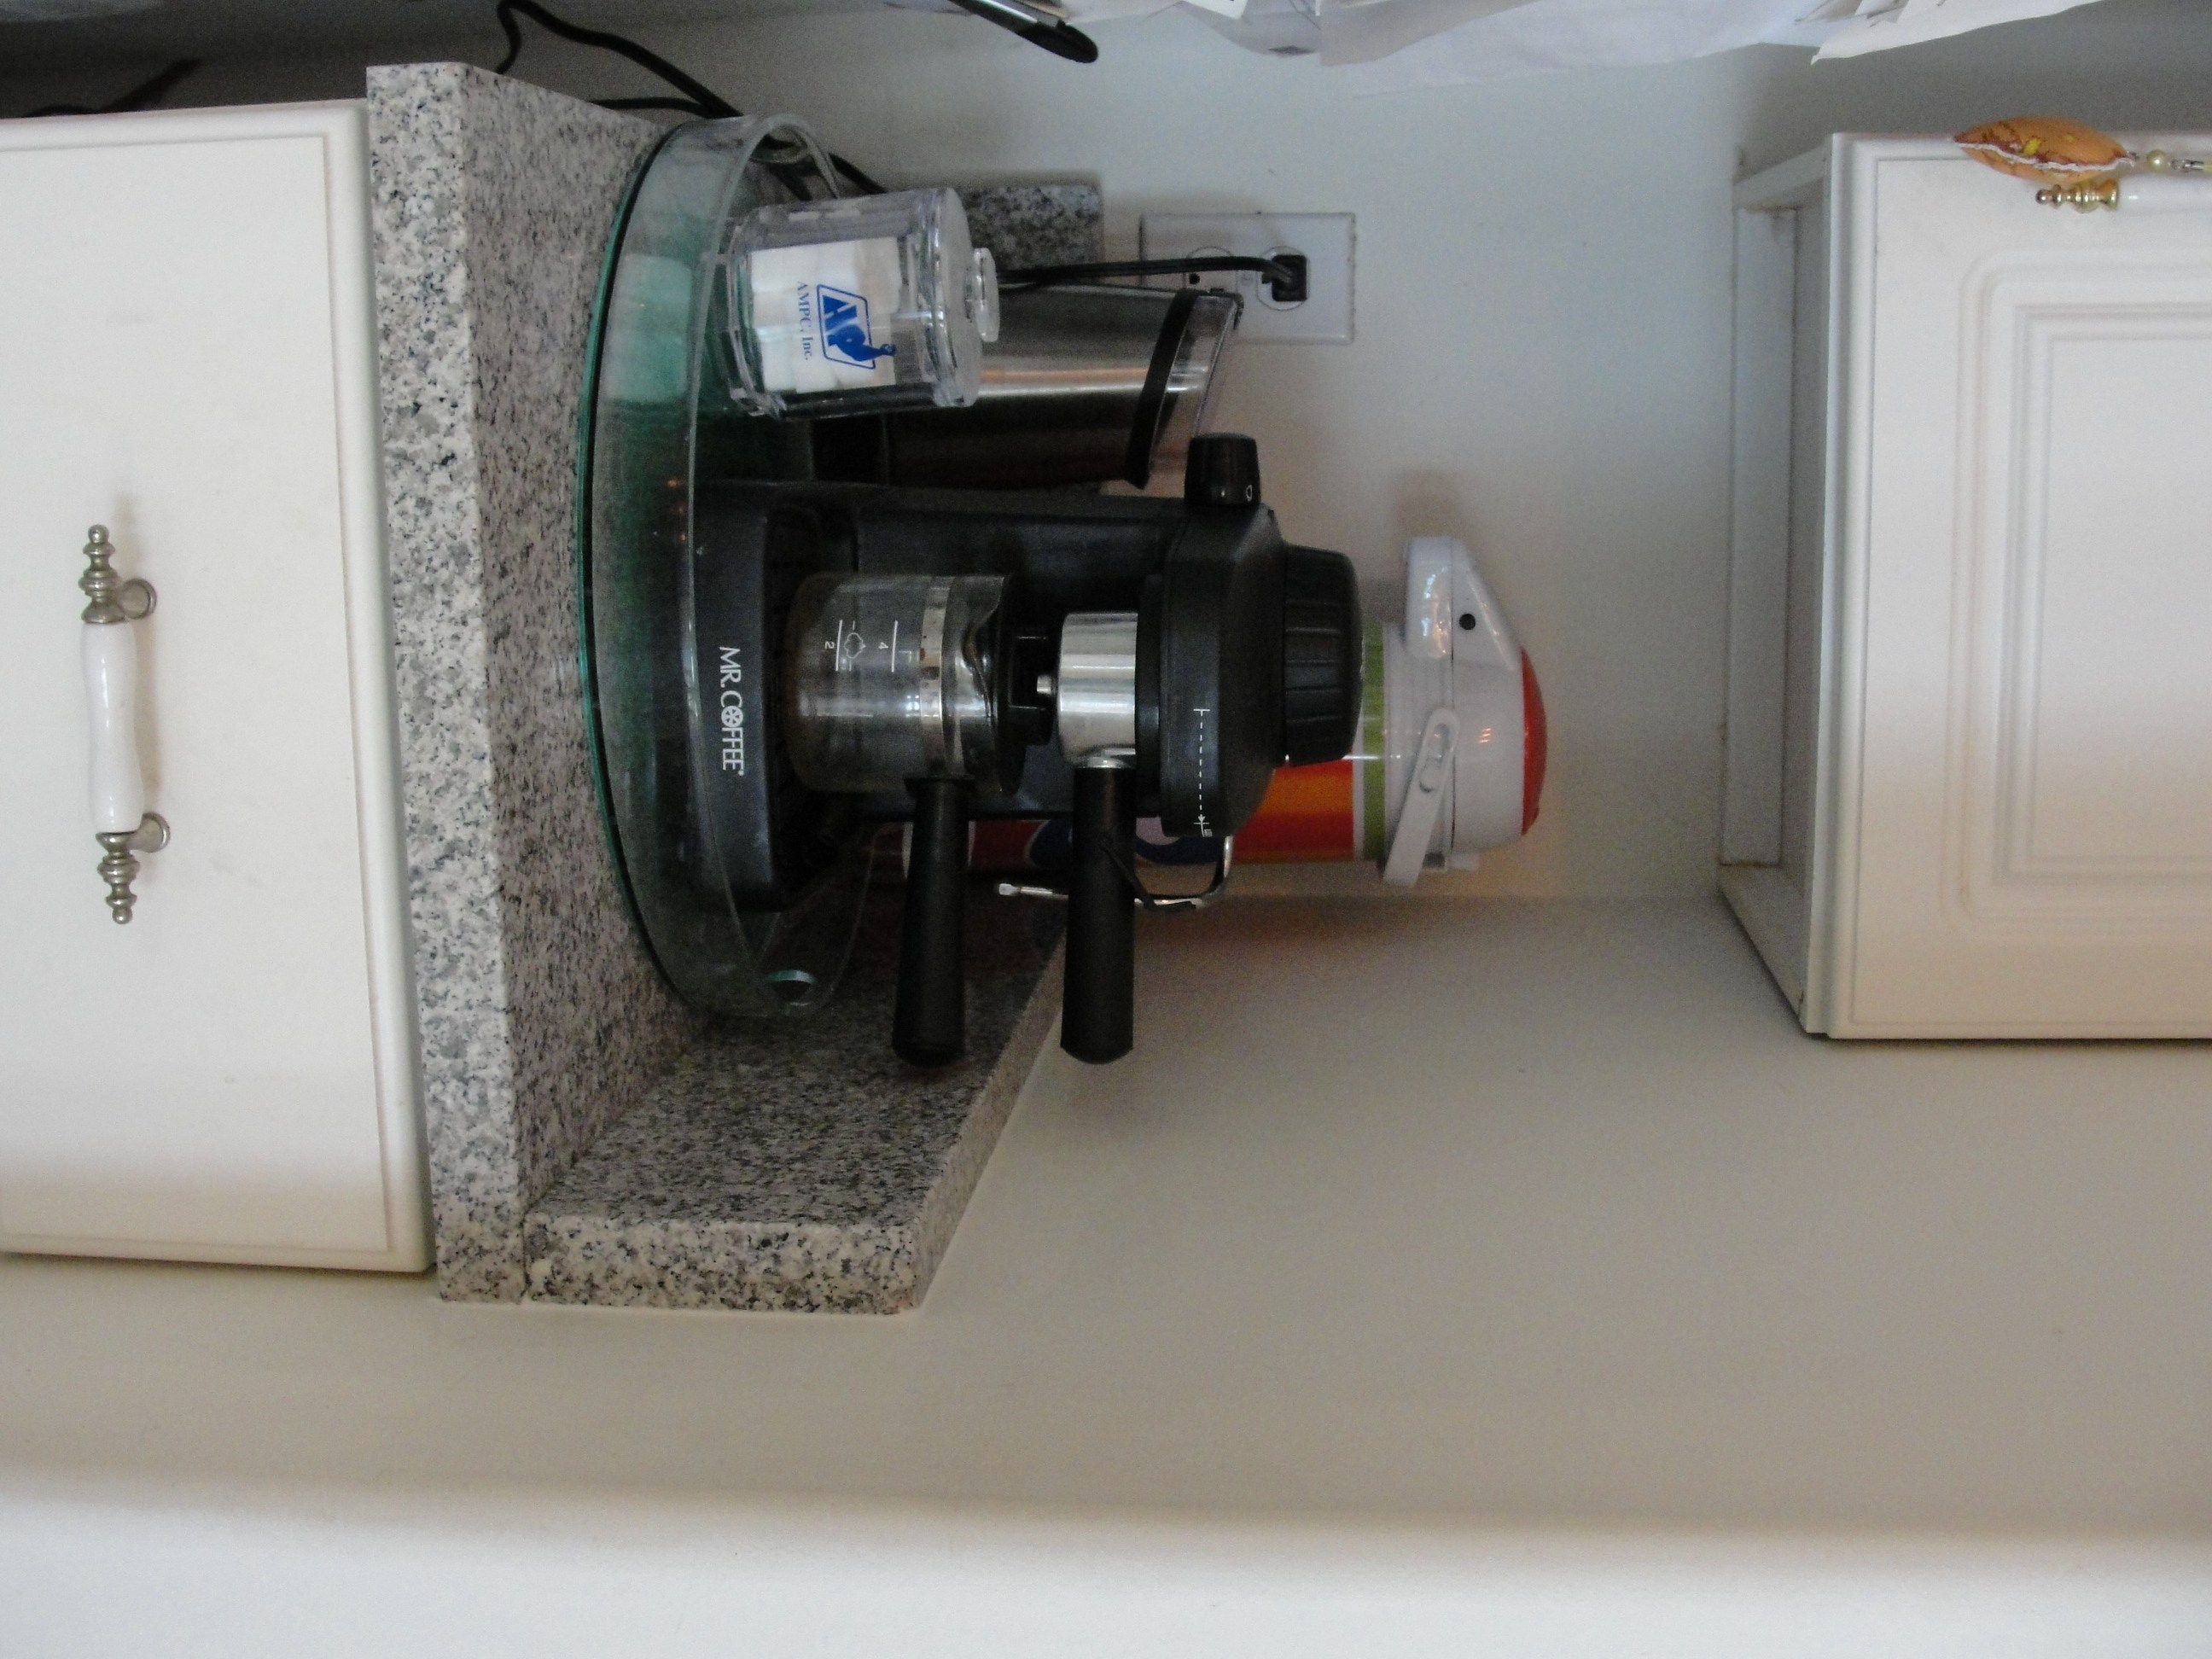 lowes kitchen cabinets white sinks 小厨房旧貌换新颜 还在进行时 南方朱槿的网上家园 after5